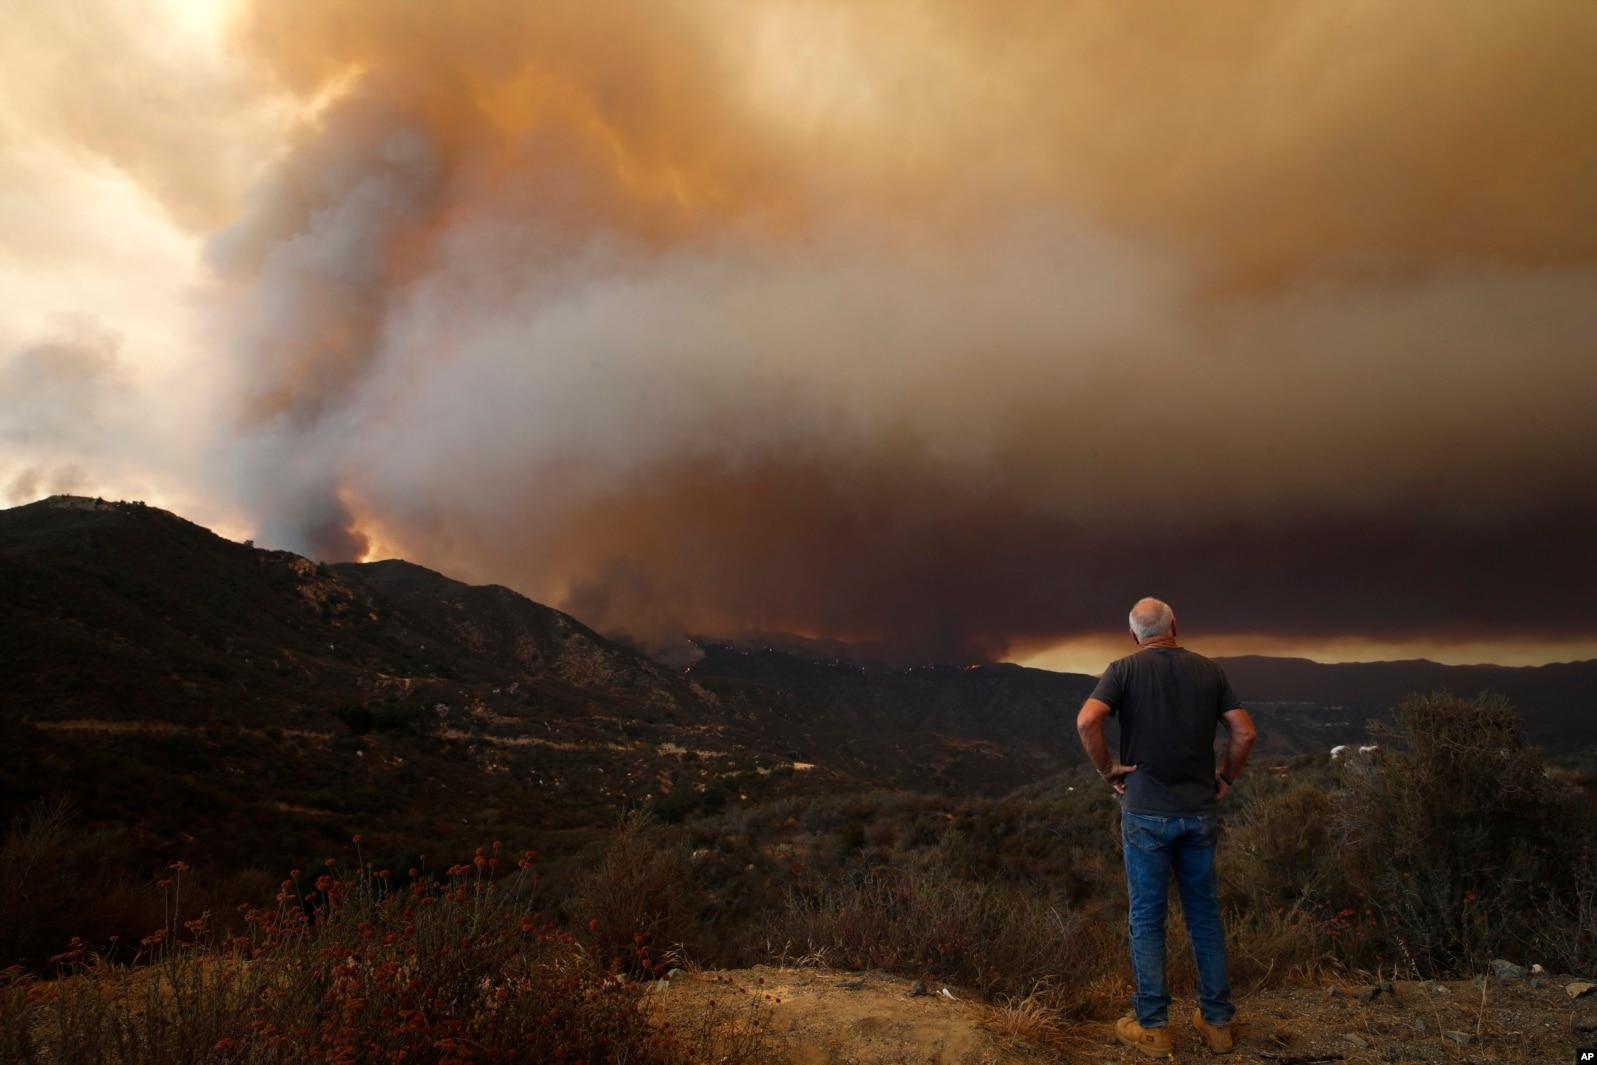 Tim Grant observa un incendio en el Bosque Nacional Cleveland en California el 8 de agosto de 2018. - AP